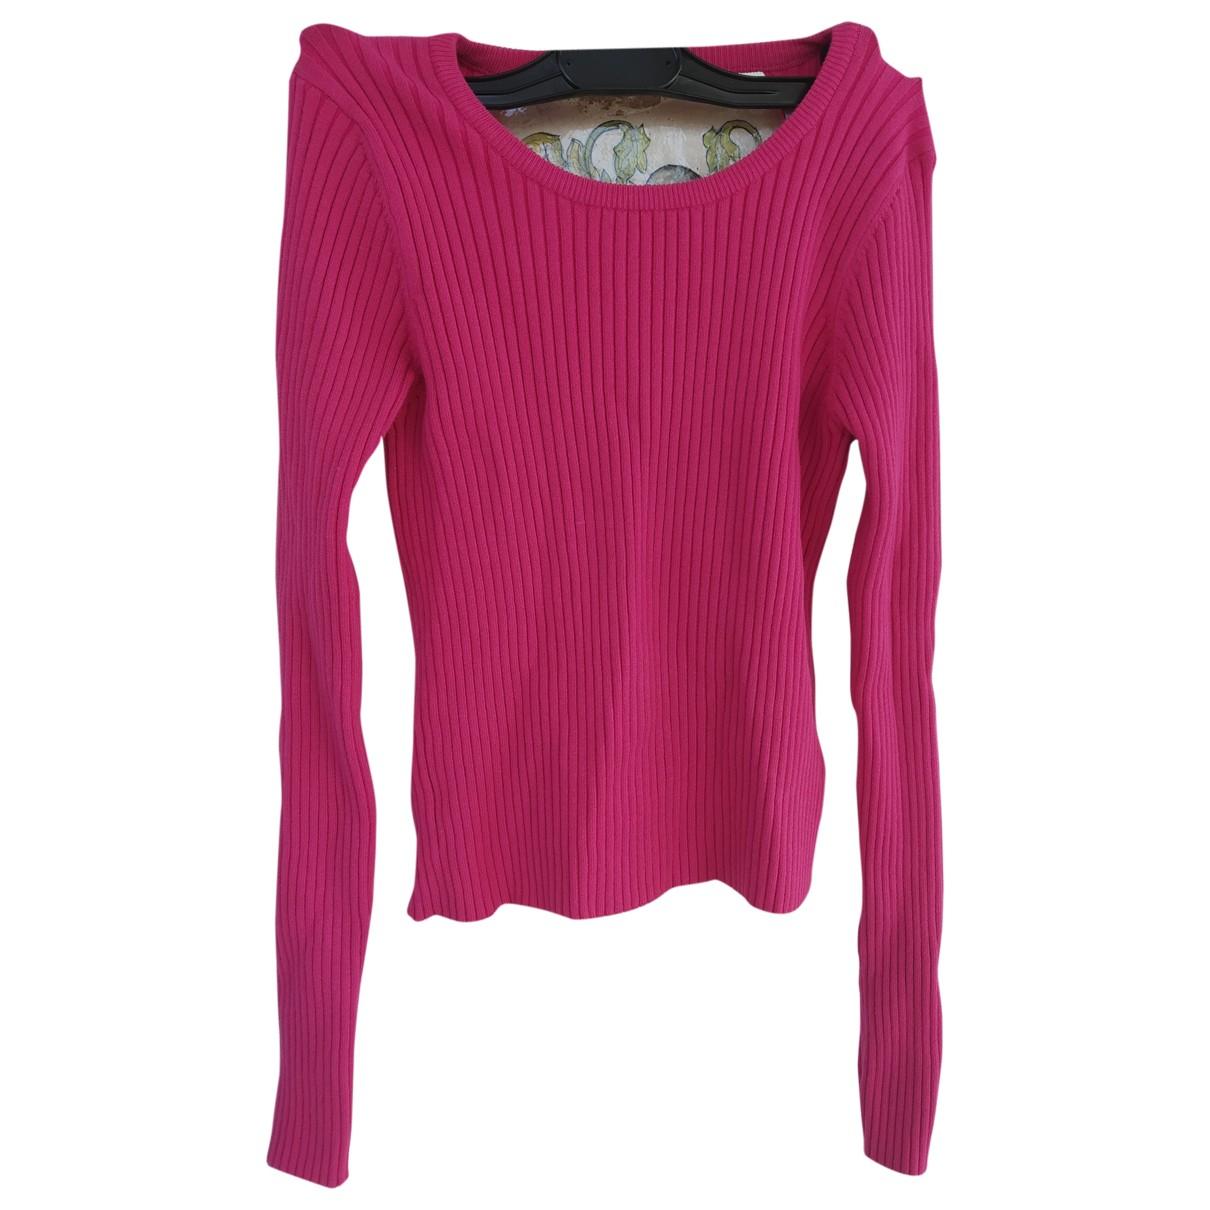 Zara \N Pink Cotton  top for Women M International